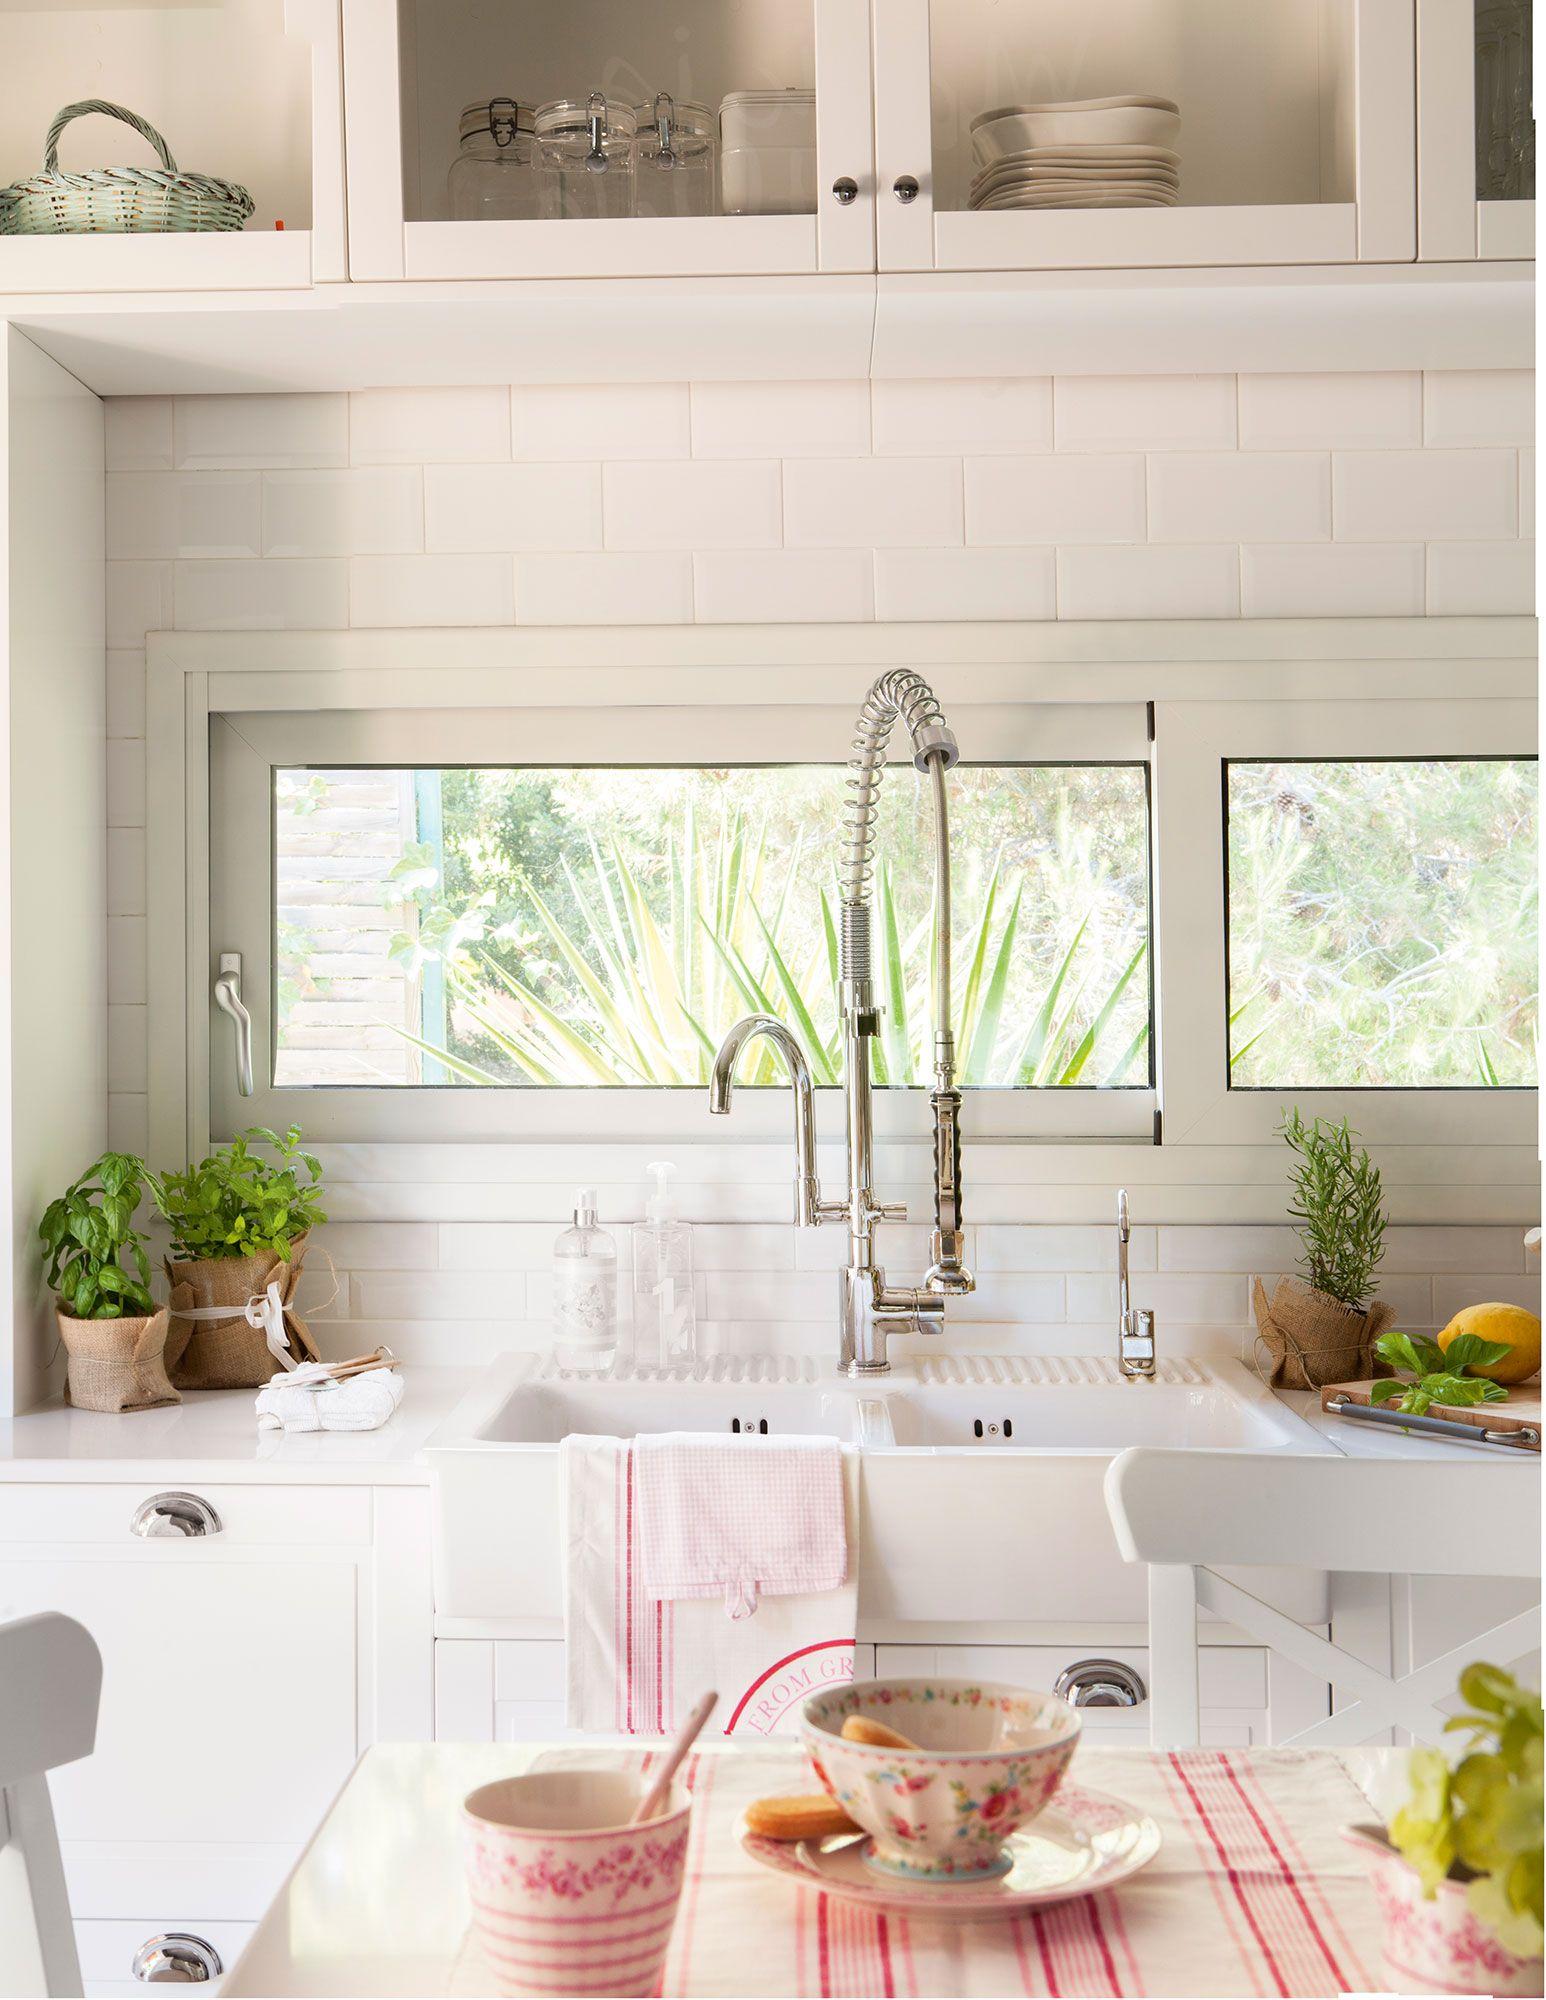 Detalle de fregadero xl de cocina con un grifo de estilo industrial